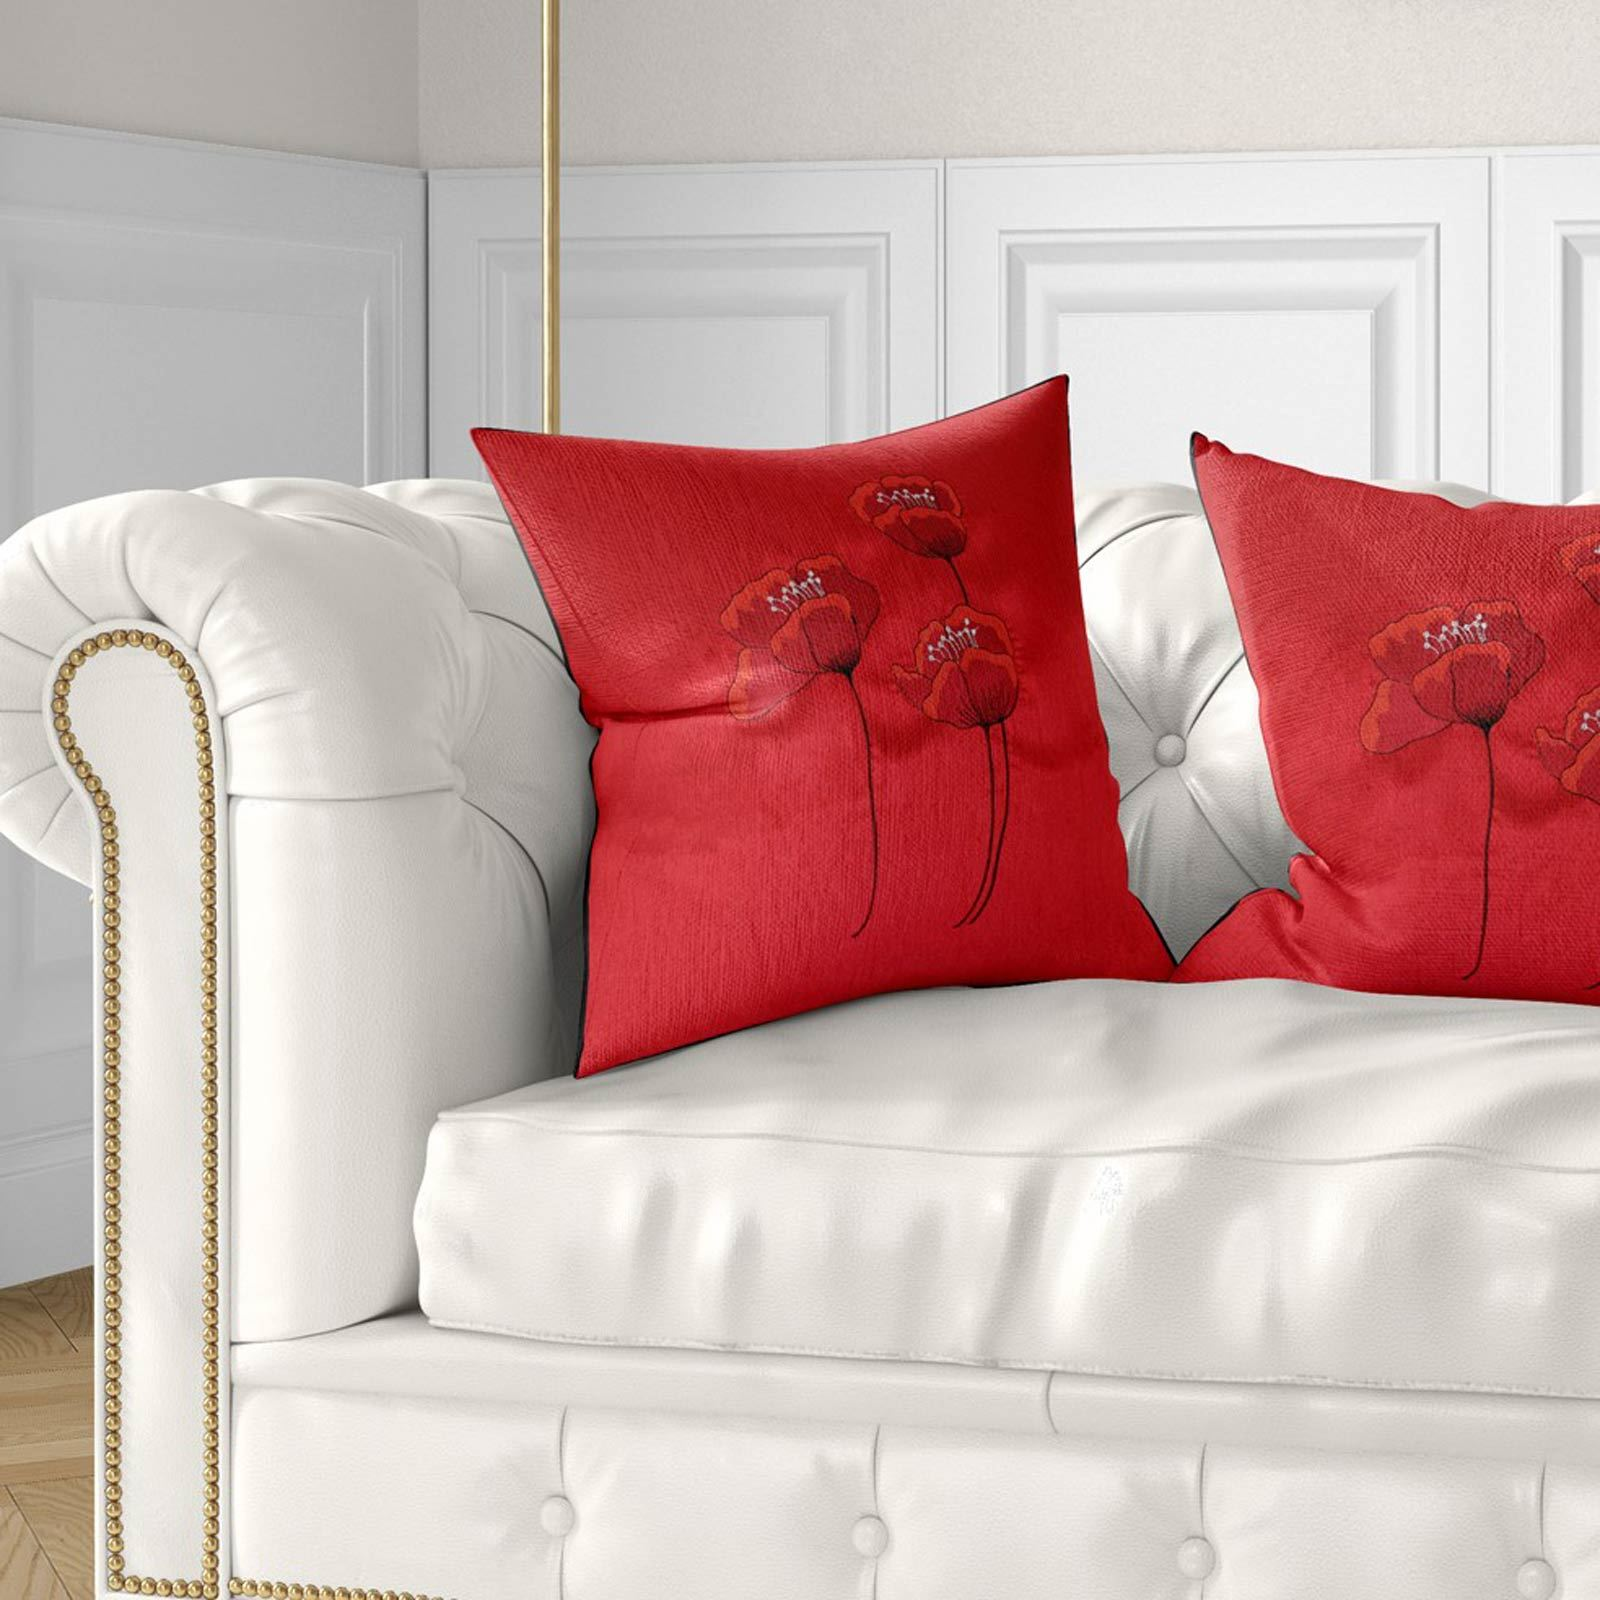 Vino-Tinto-Cushion-Covers-Coleccion-17-034-18-034-43cm-45cm-Cubierta miniatura 36